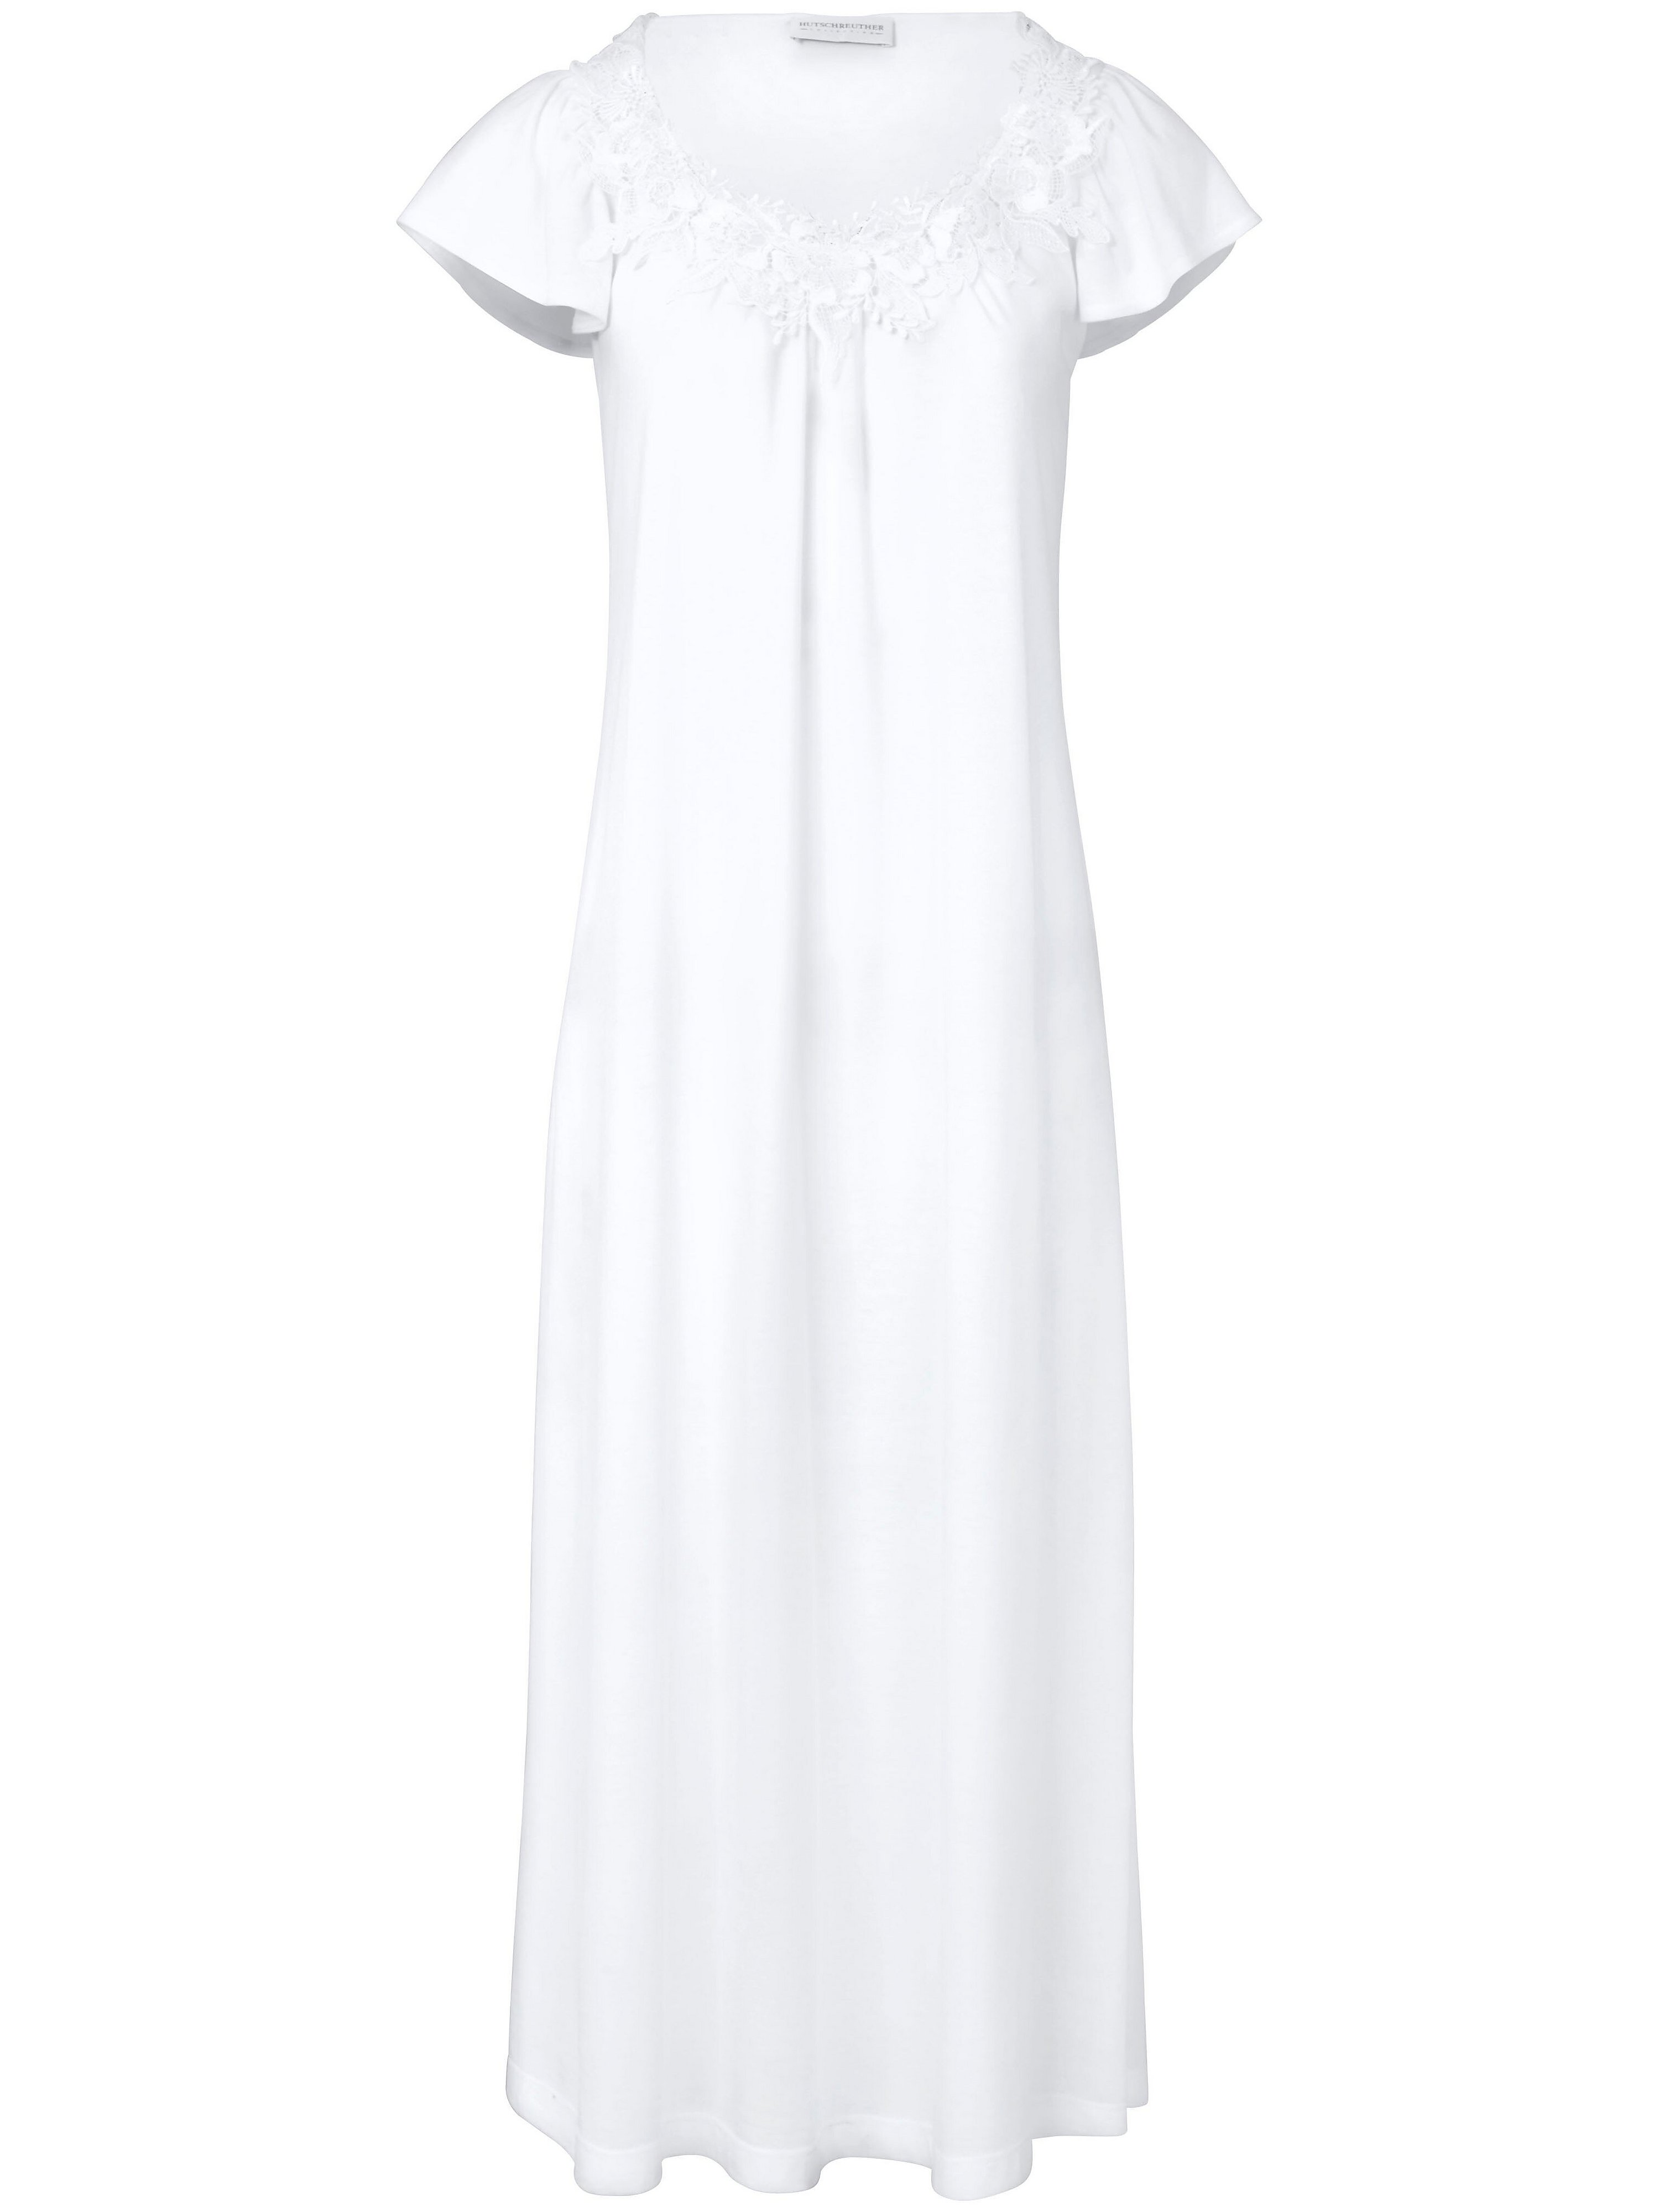 La chemise nuit unie, manches courtes  Hutschreuther blanc taille 46